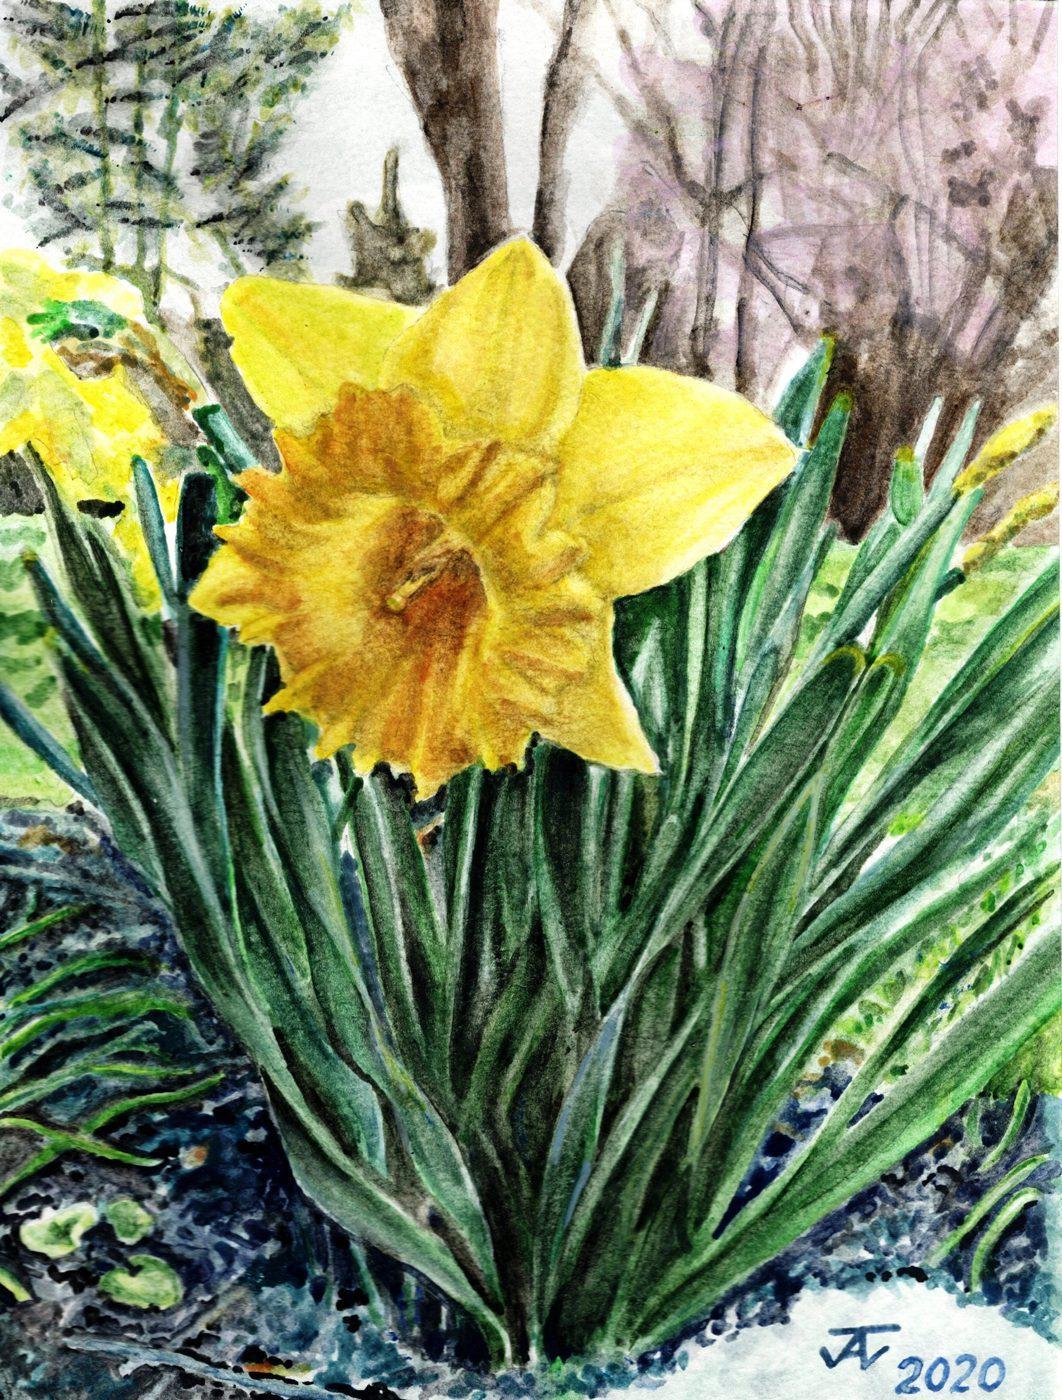 John Campbell, Spring...No matter what